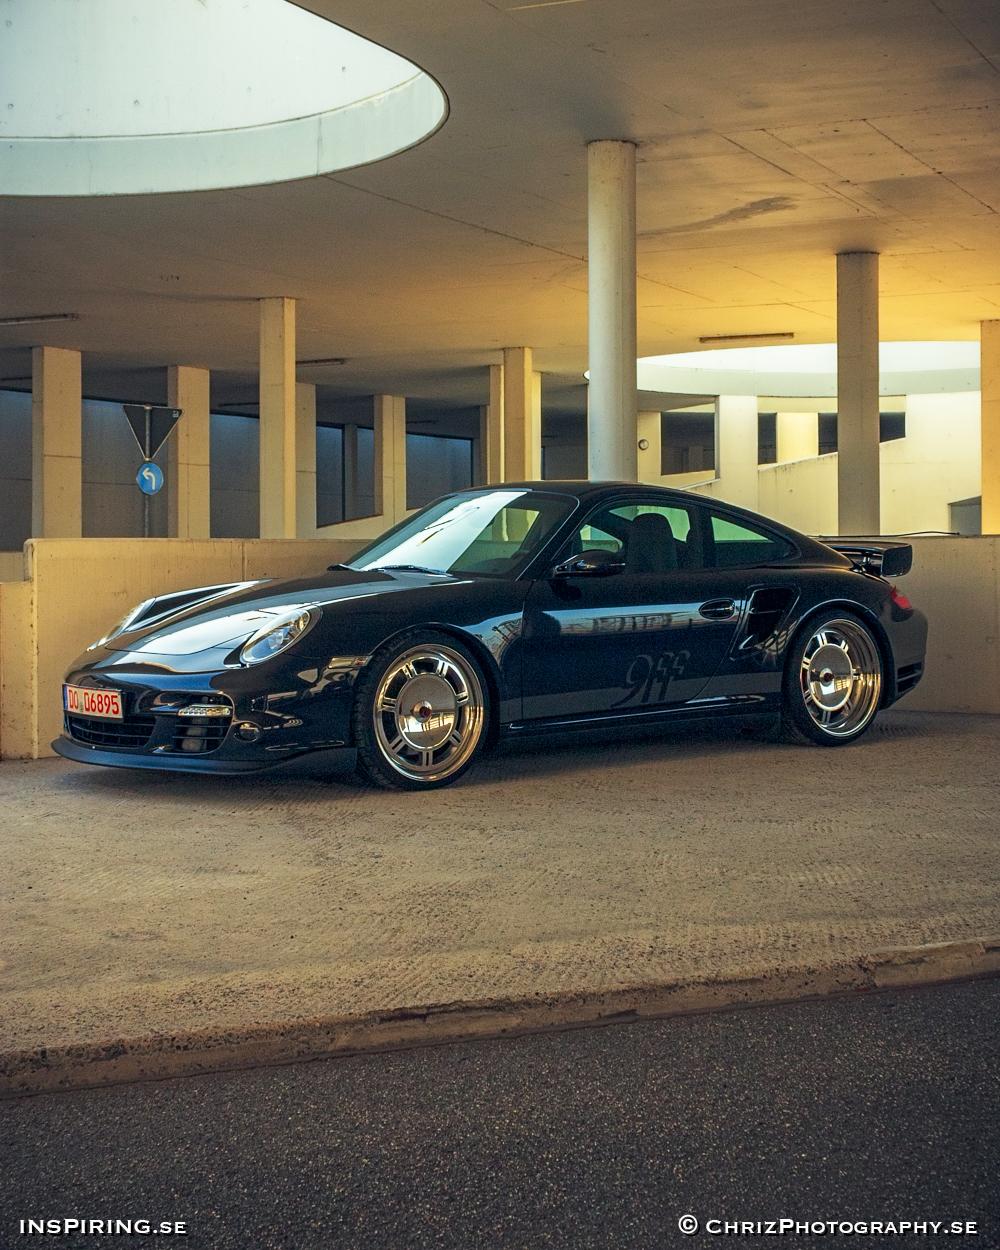 Inspiring.se_OUTTHERE_copyright_ChrizPhotography.se_640_Porsche9ff_Turbo.jpg